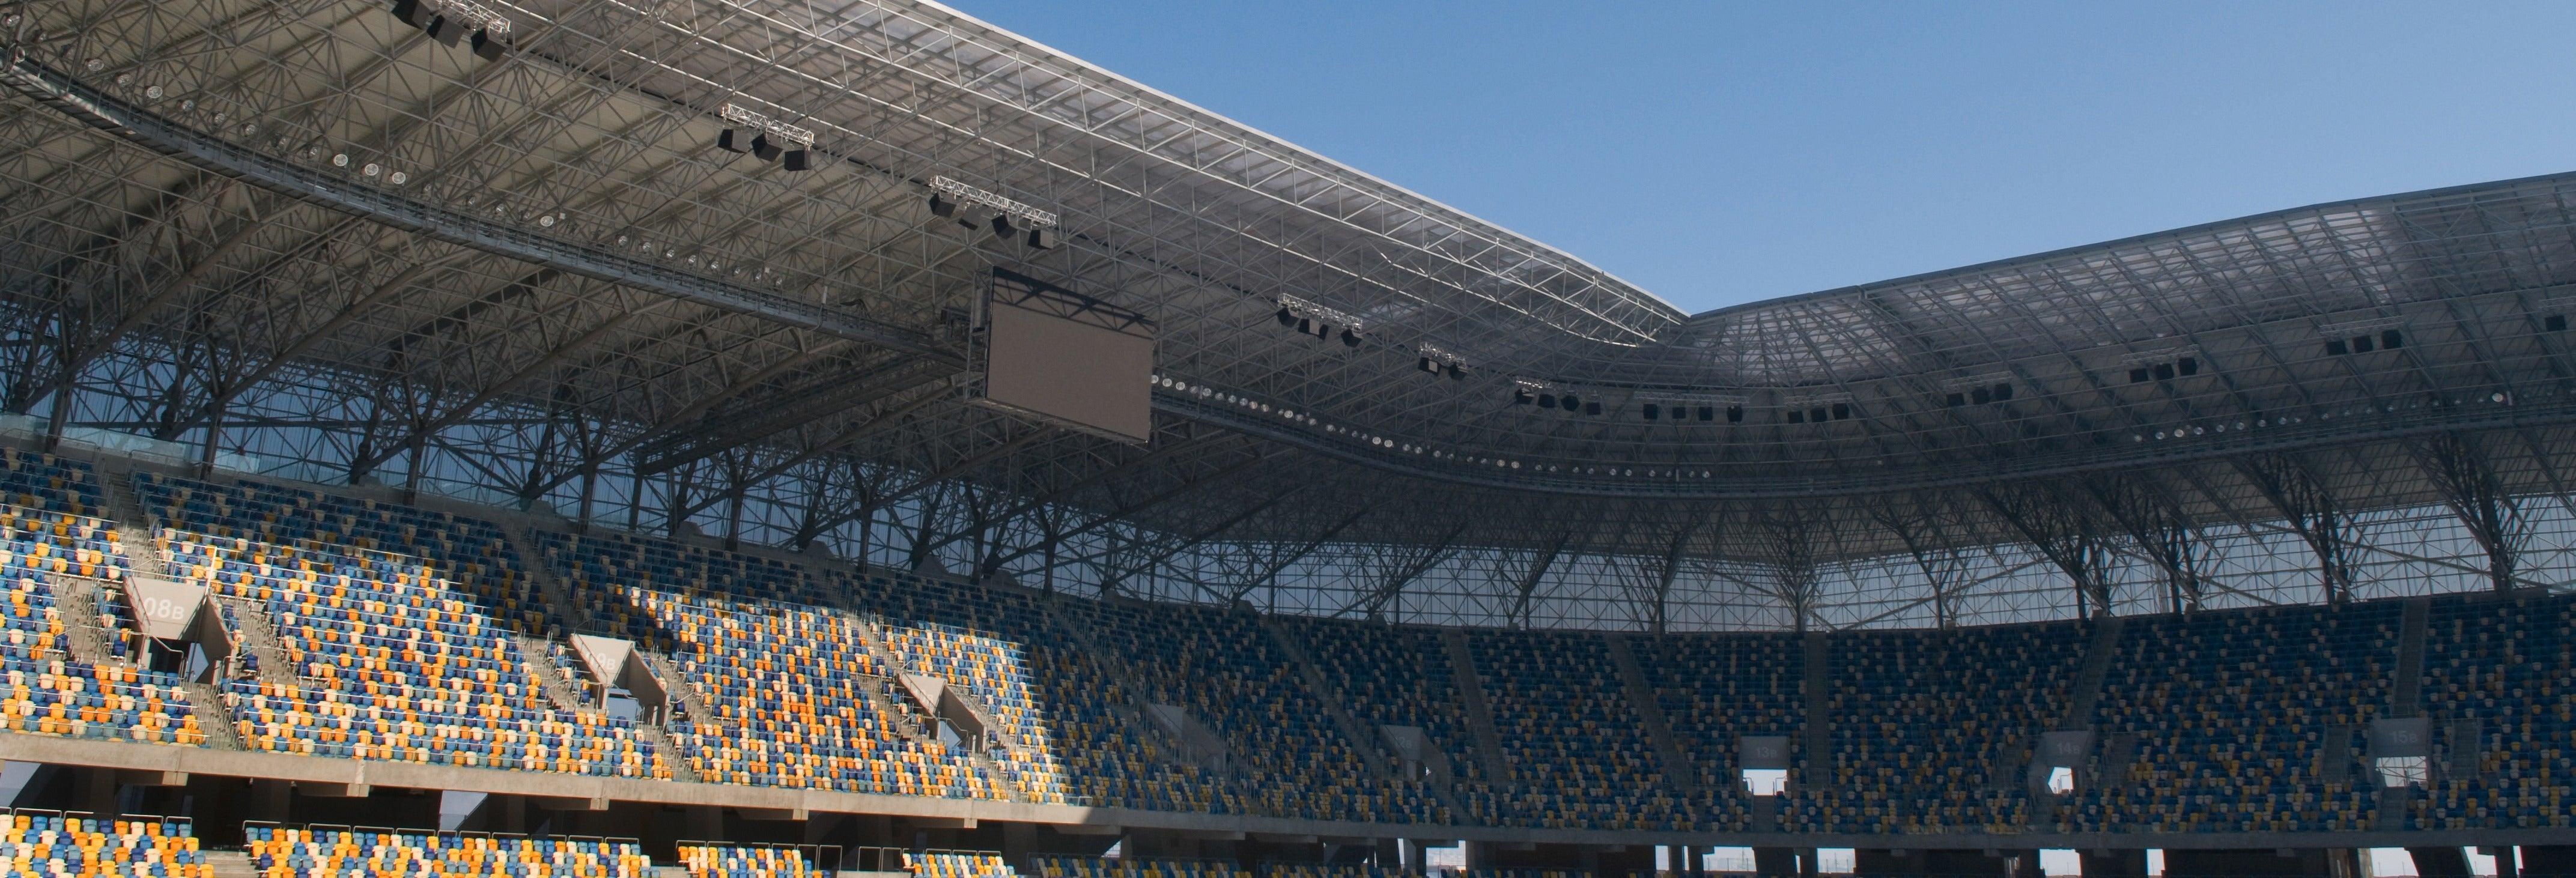 Tour por los estadios de fútbol de Kiev